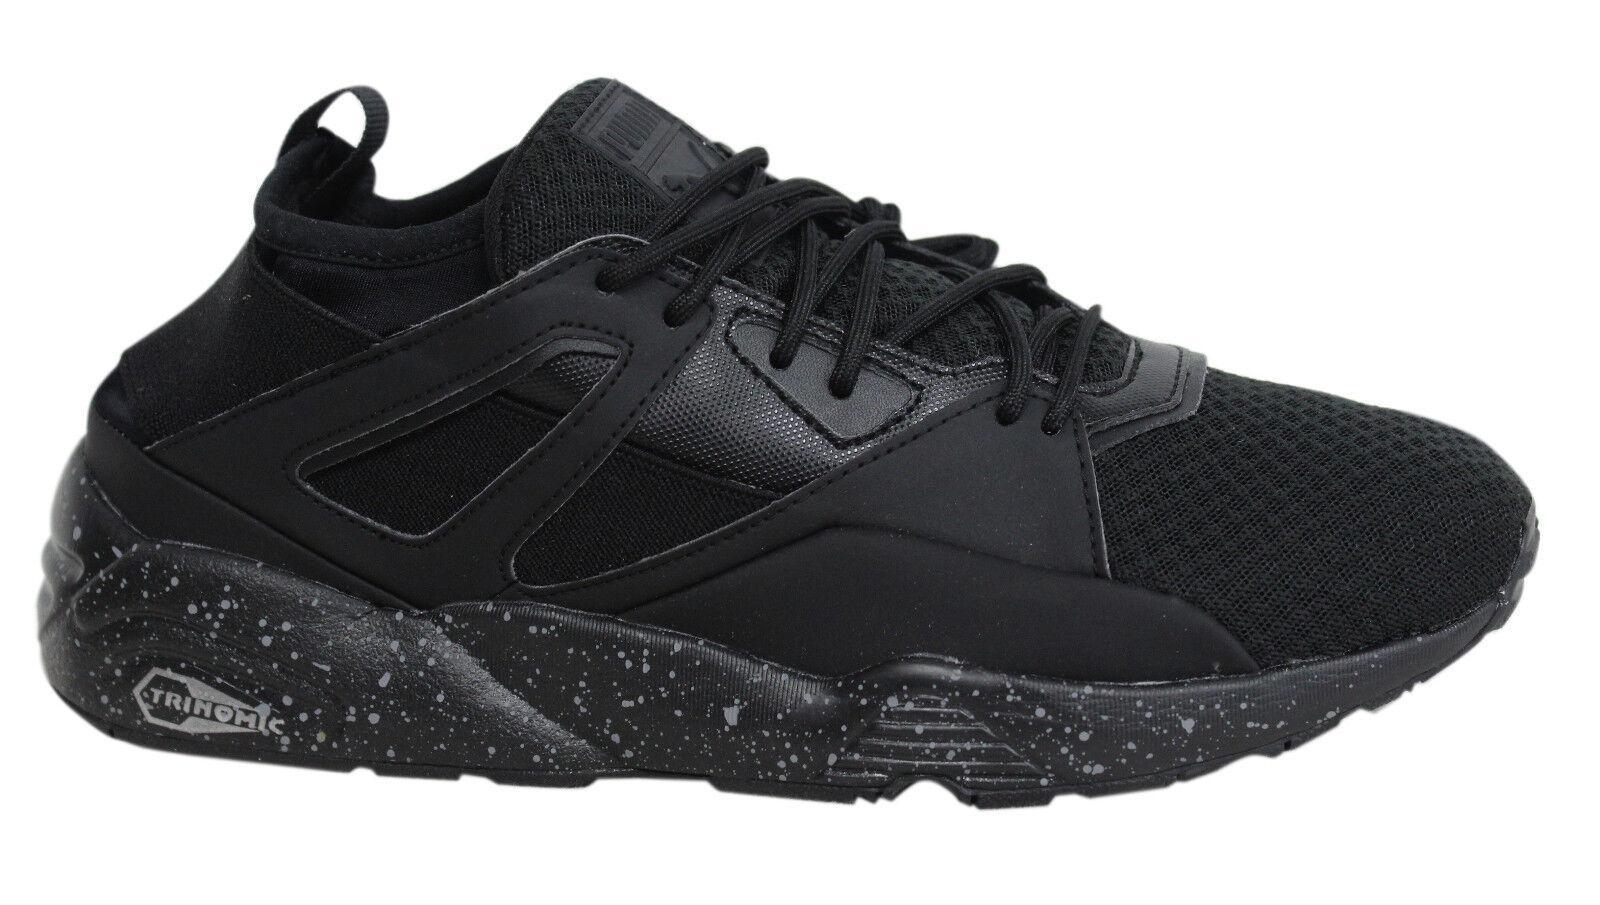 Puma Blaze Of Glory Sock Lace Up Black Mens Textile Trainers 362520 01 M12